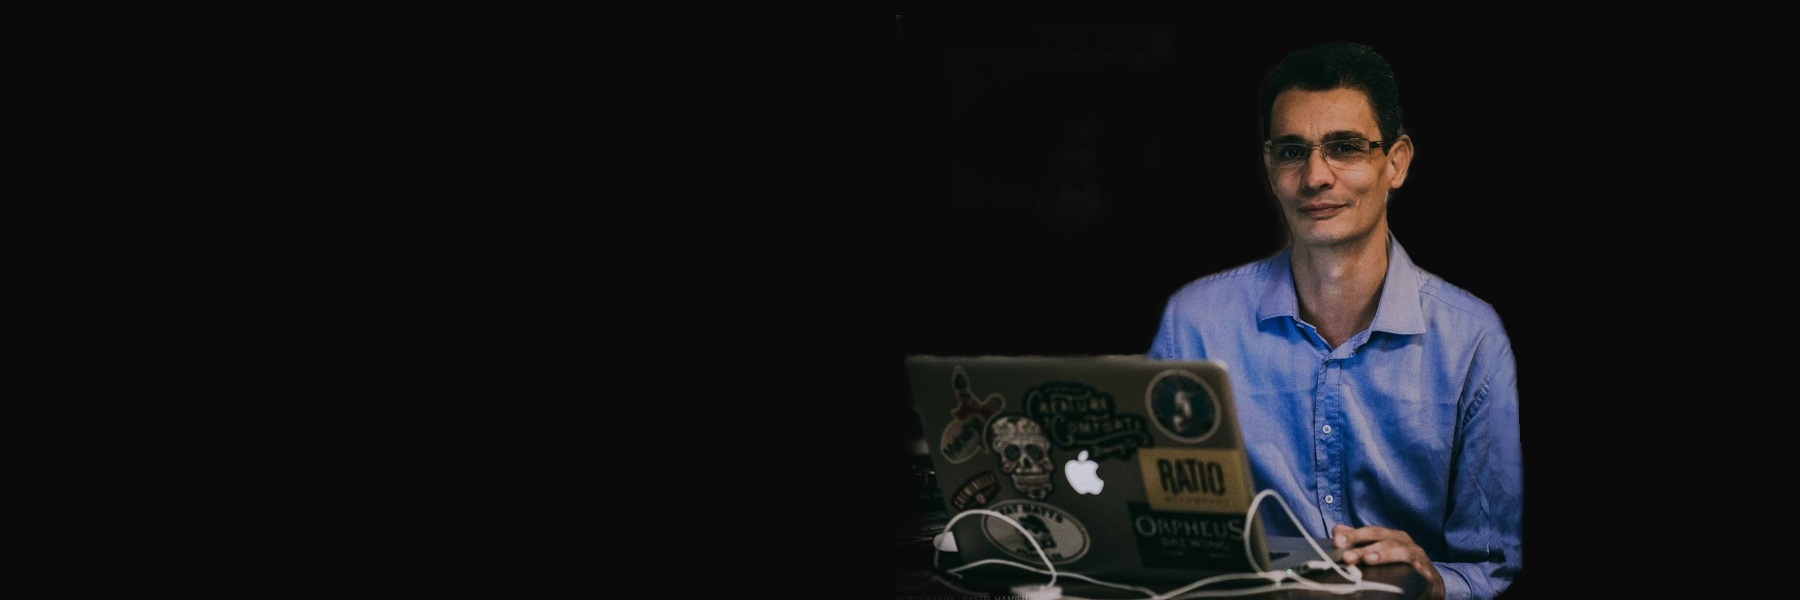 DJ-TANGO-ANGEL-MONTERO-1800X600